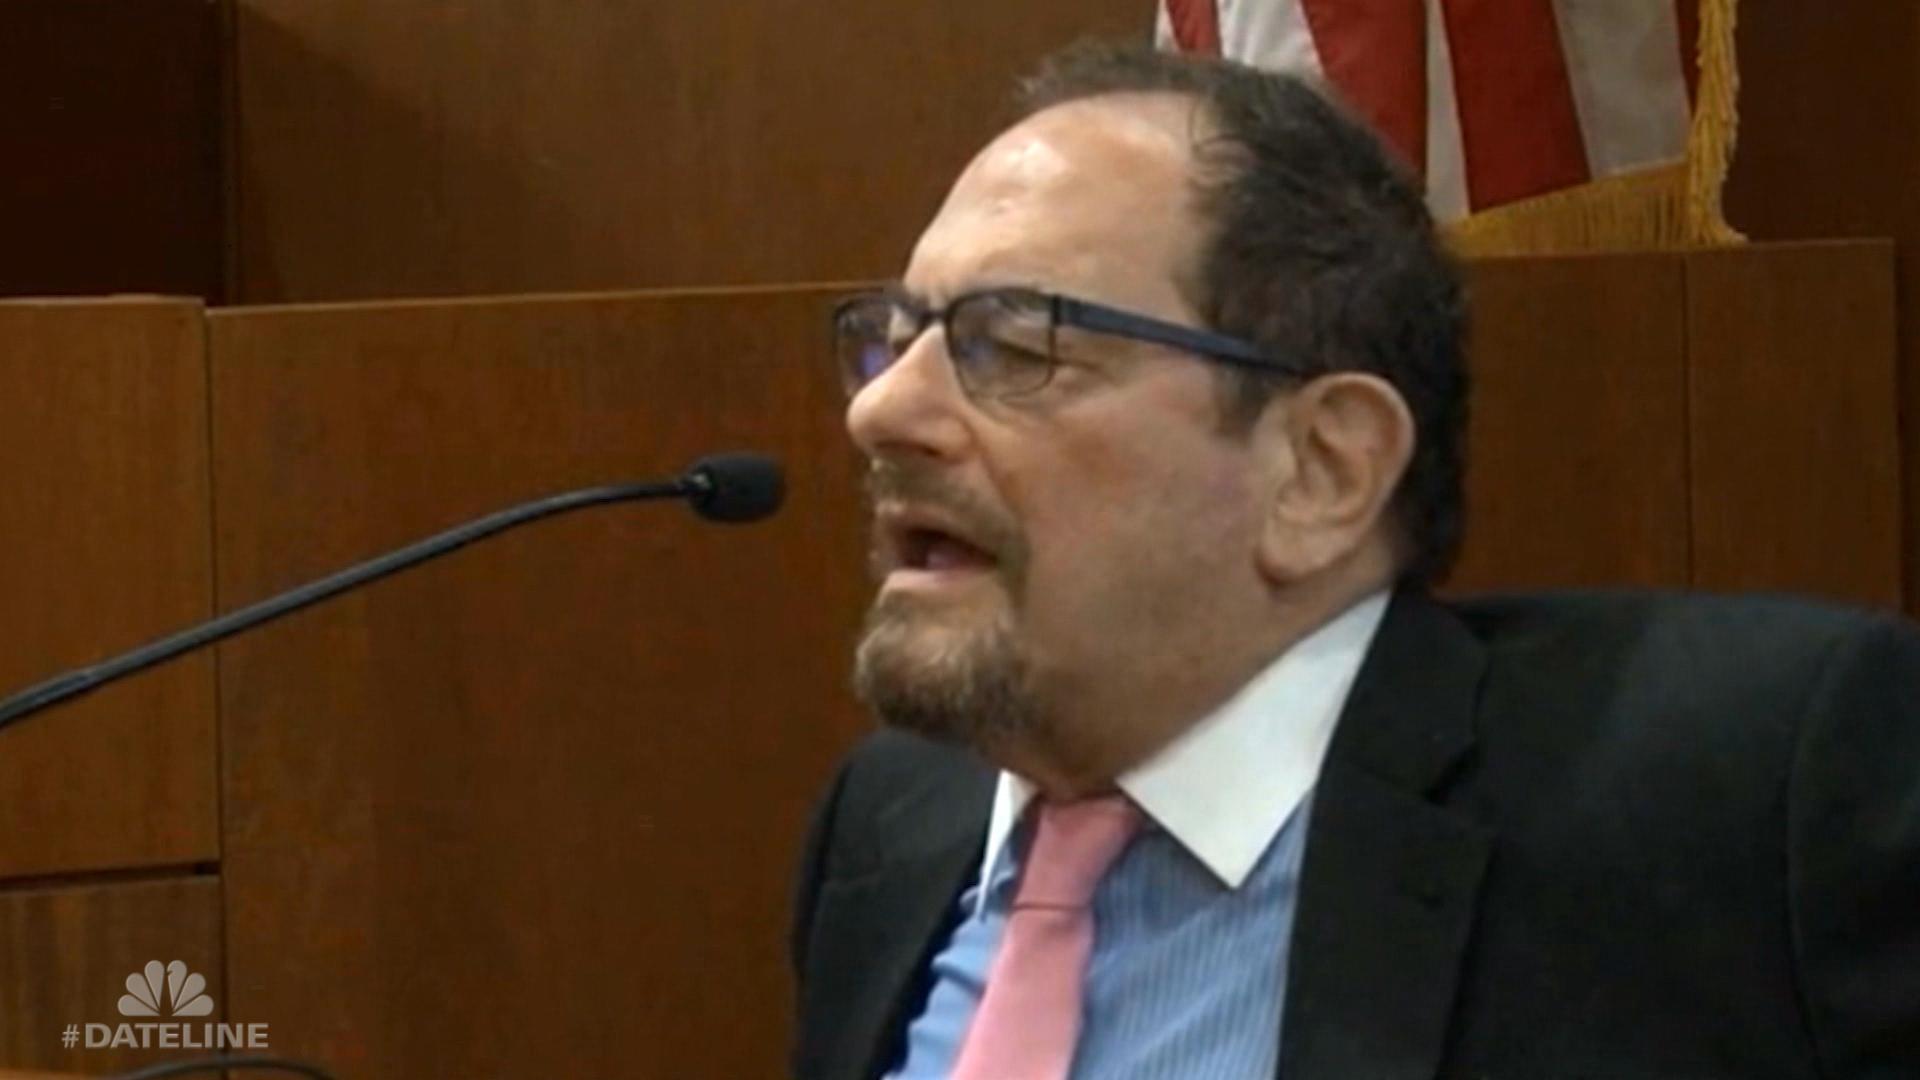 Dateline NBC Exclusive: Robert Durst's Friend Testifies Against Him about Murder of Susan Berman